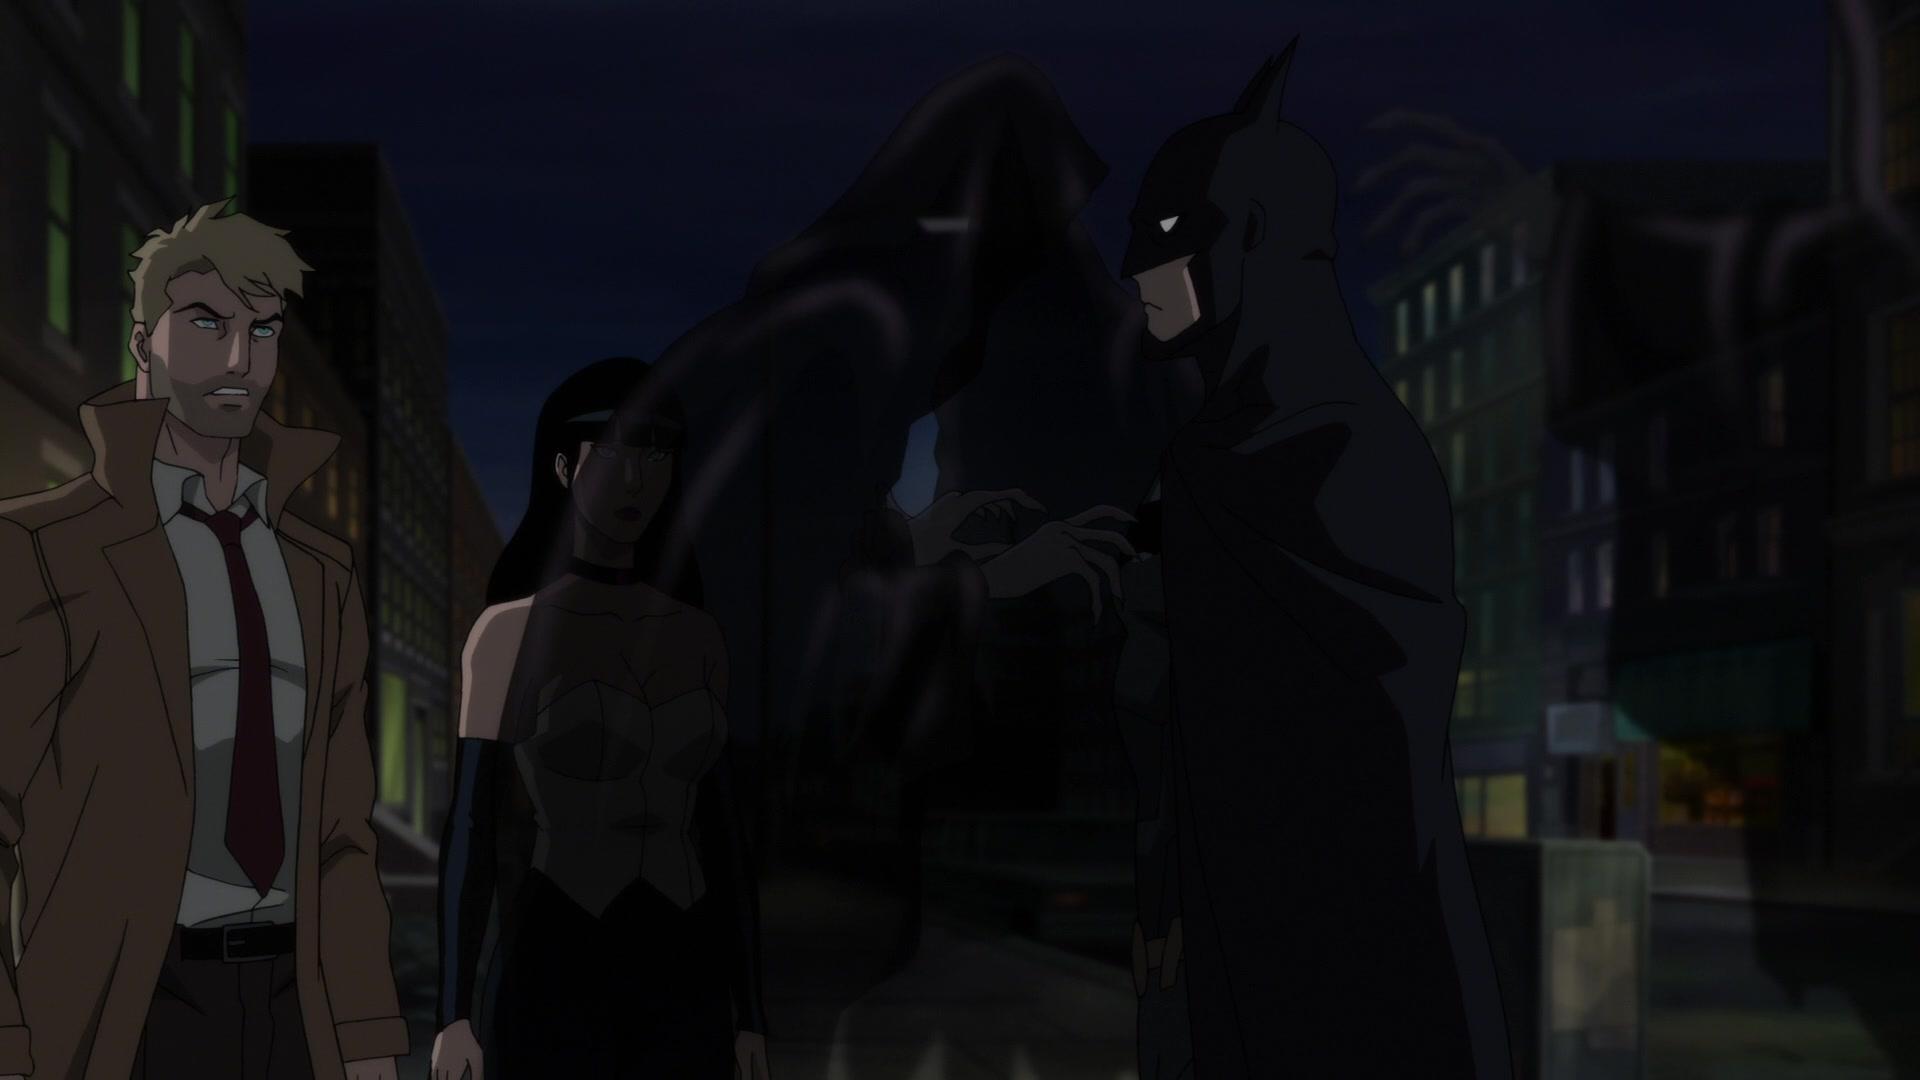 justice_league_dark_2017_screenshot_0700.jpg